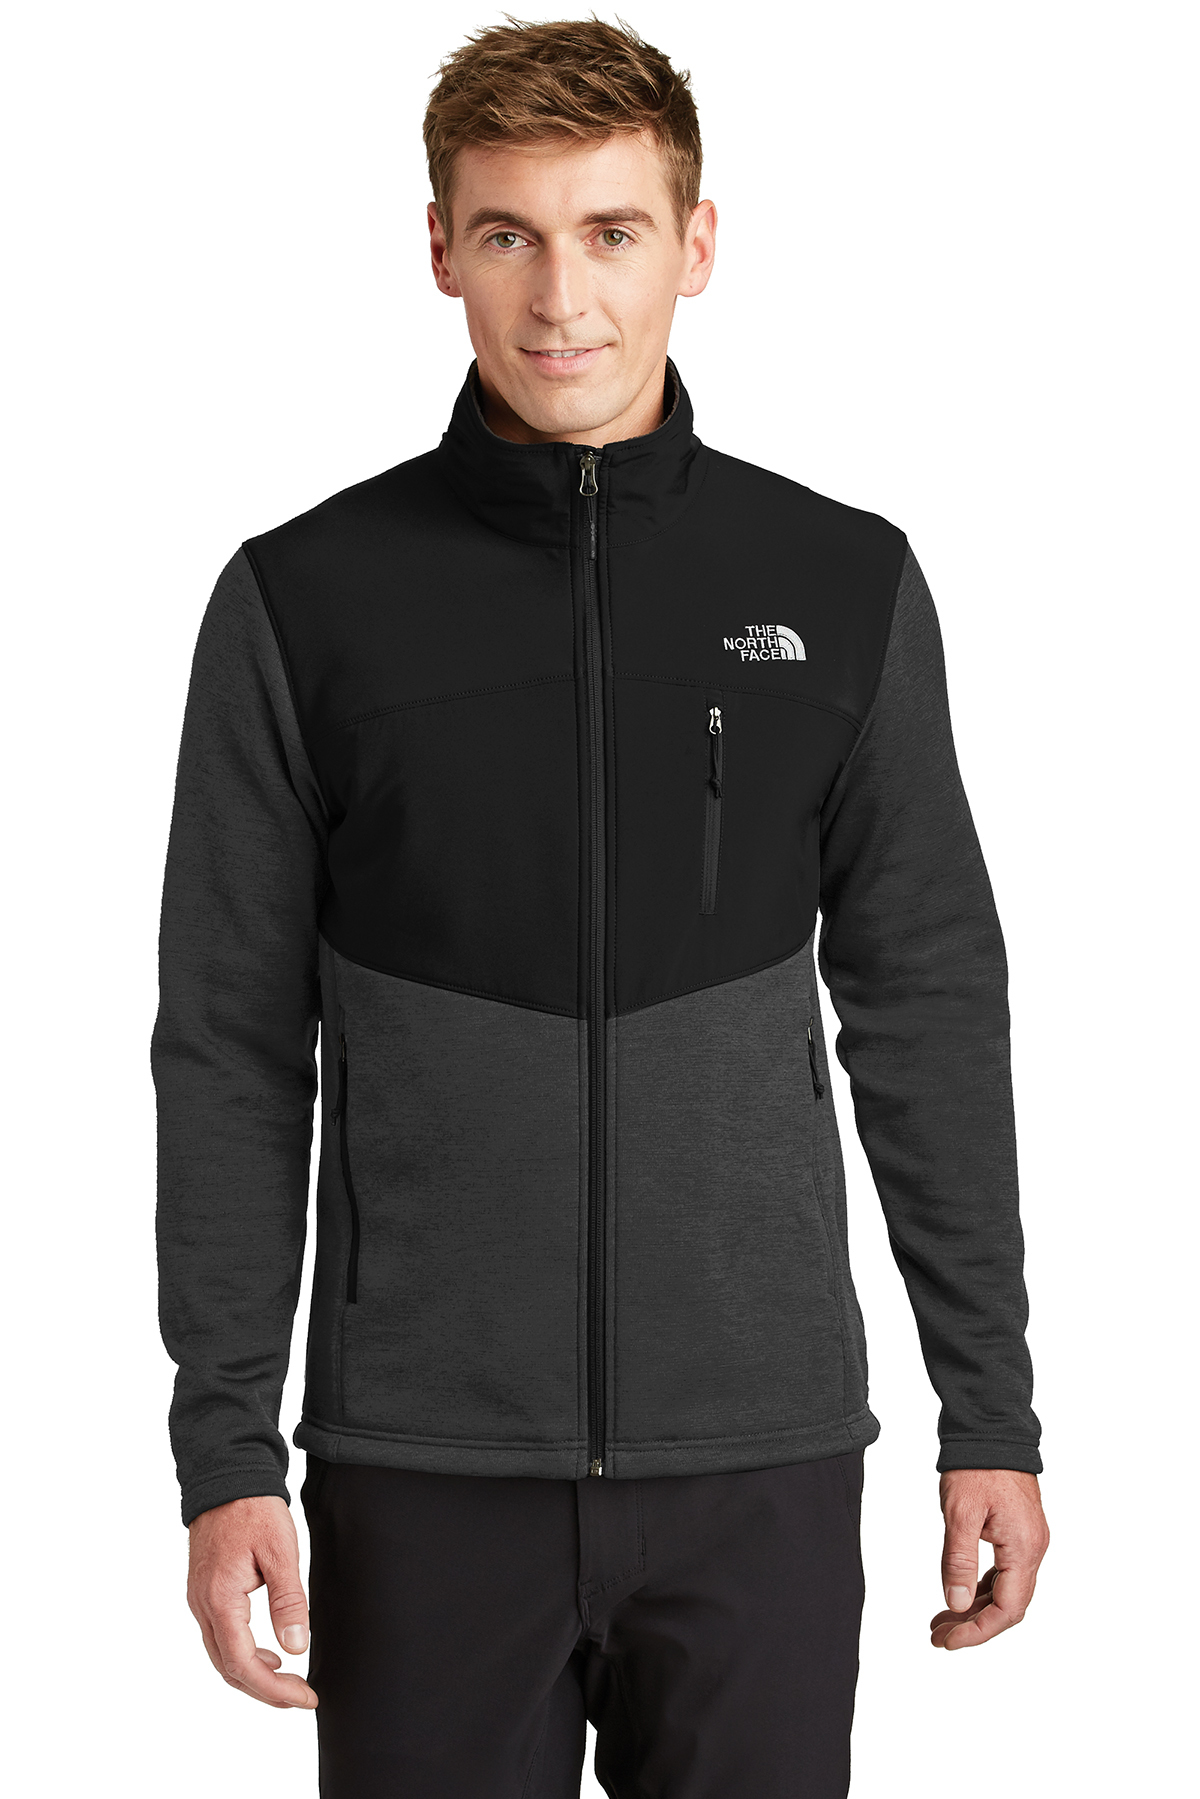 283fa496a The North Face® Far North Fleece Jacket | Corporate Jackets ...